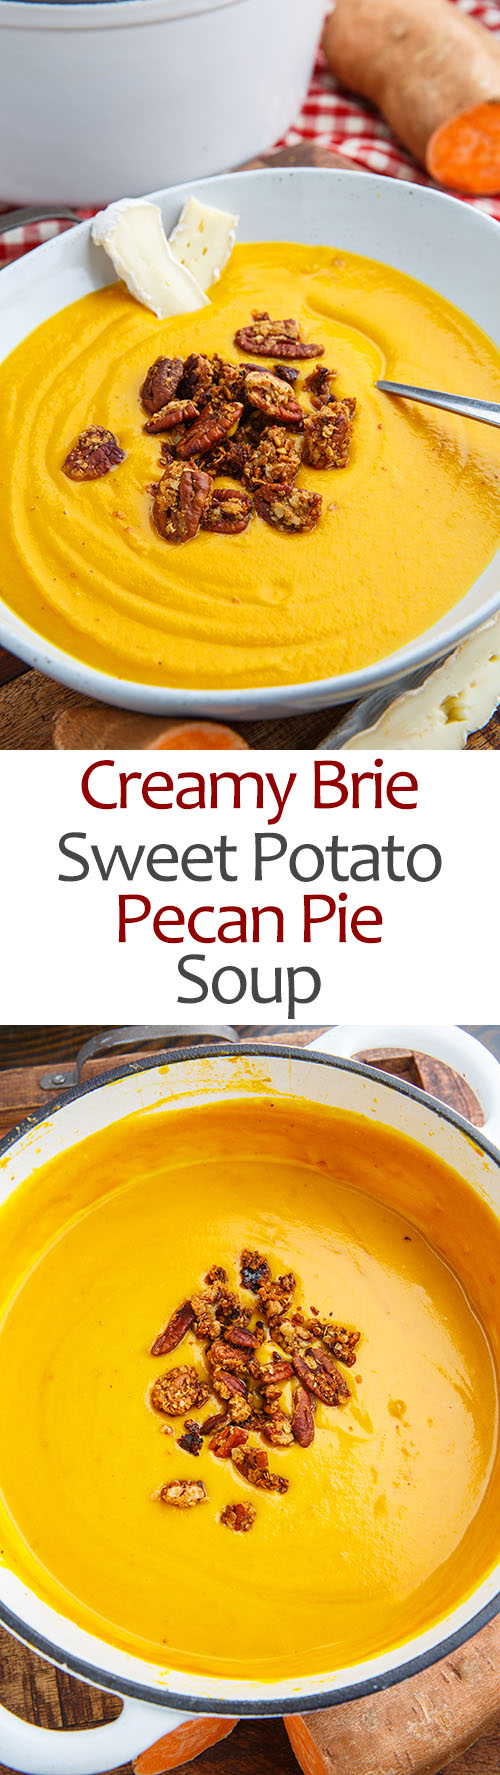 Creamy Brie Sweet Potato Pecan Pie Soup